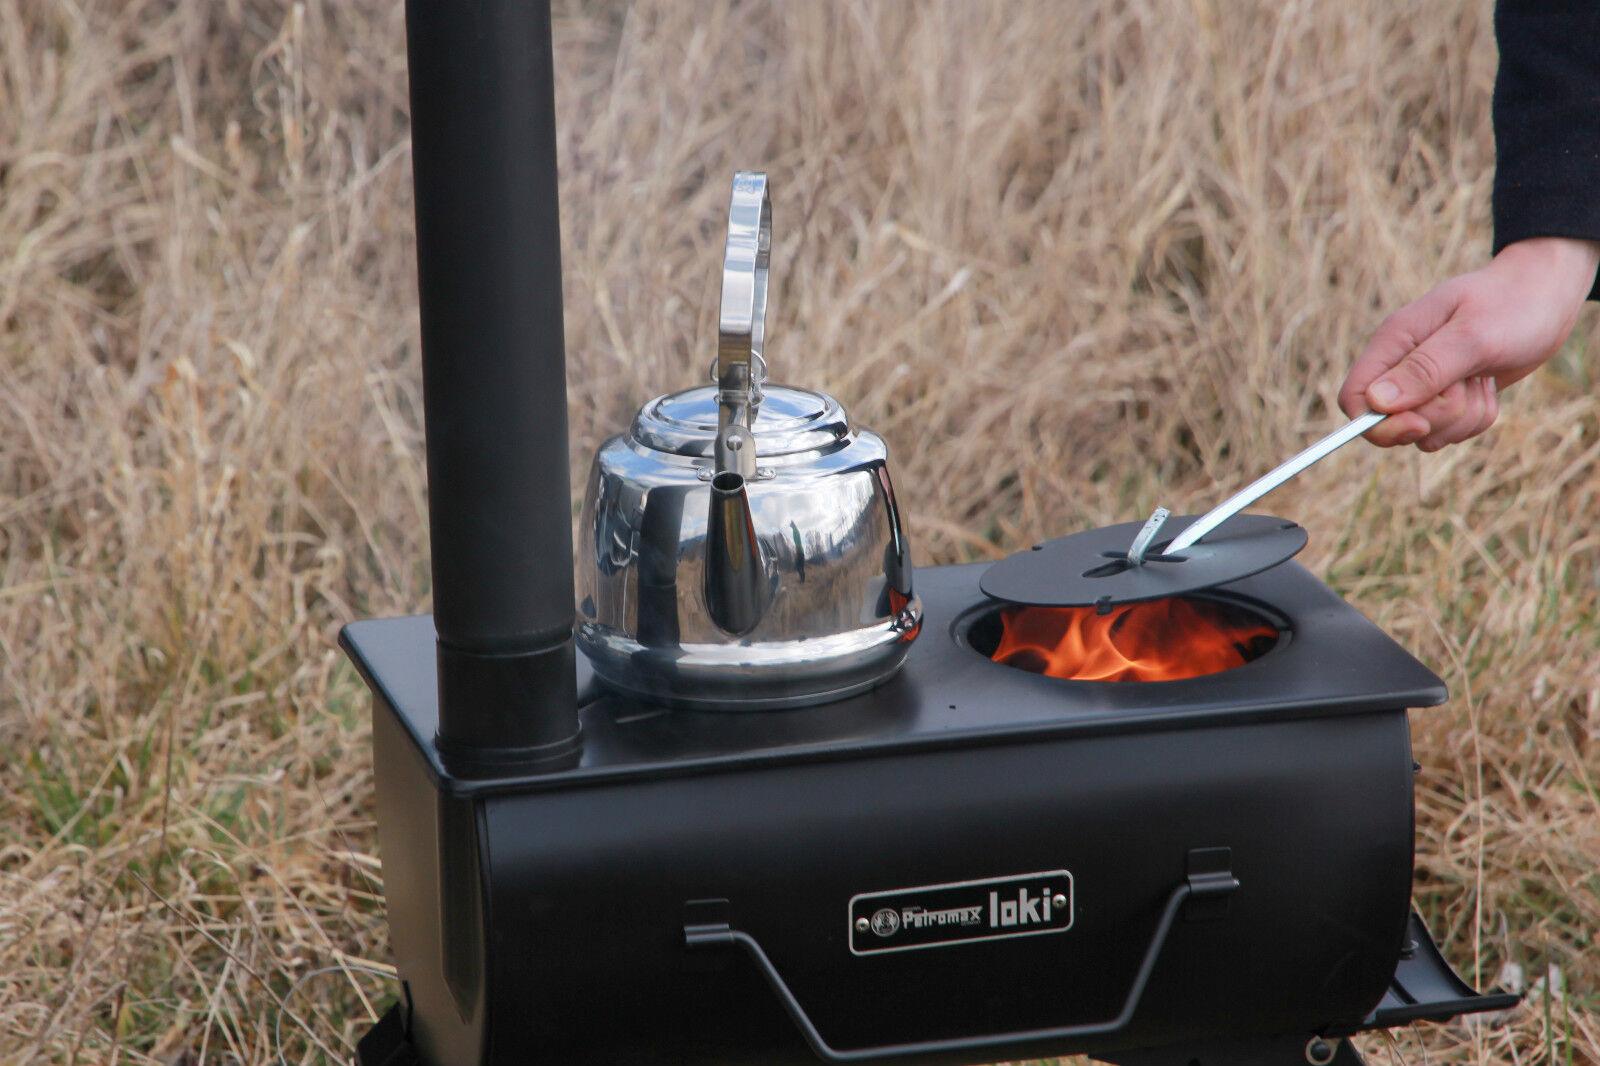 Petromax Loki Campingkocher / Zeltofen optional mit Zubehör